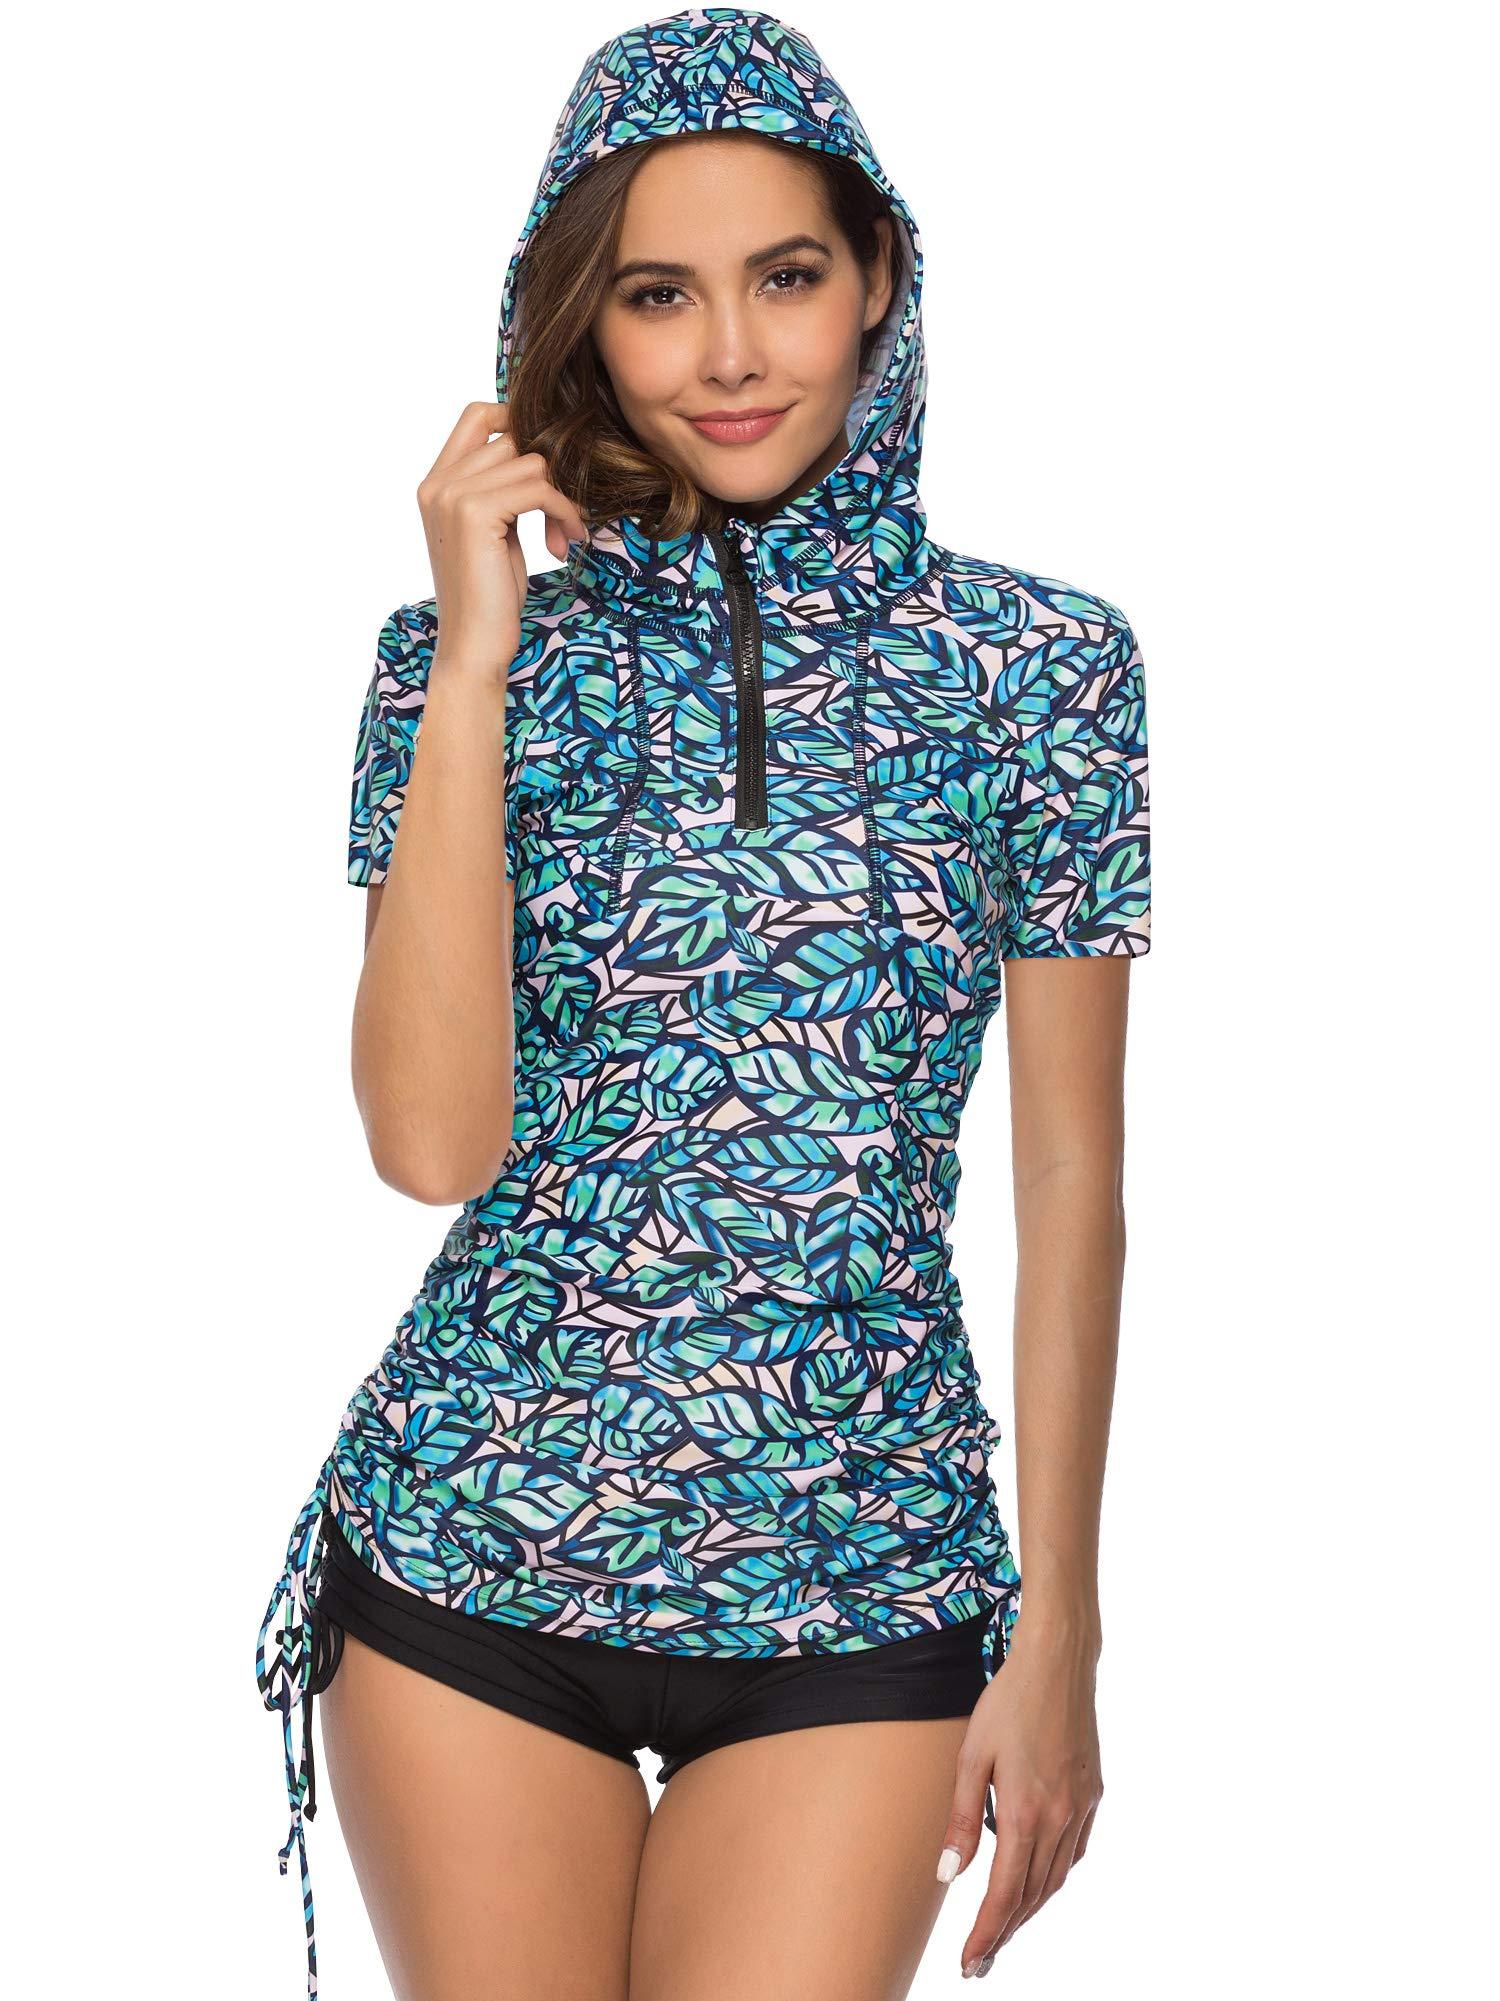 Women's UV Sun Protection Short Sleeve Hooded Rash Guard Half-Zip Side Adjustable Swimsuit Top